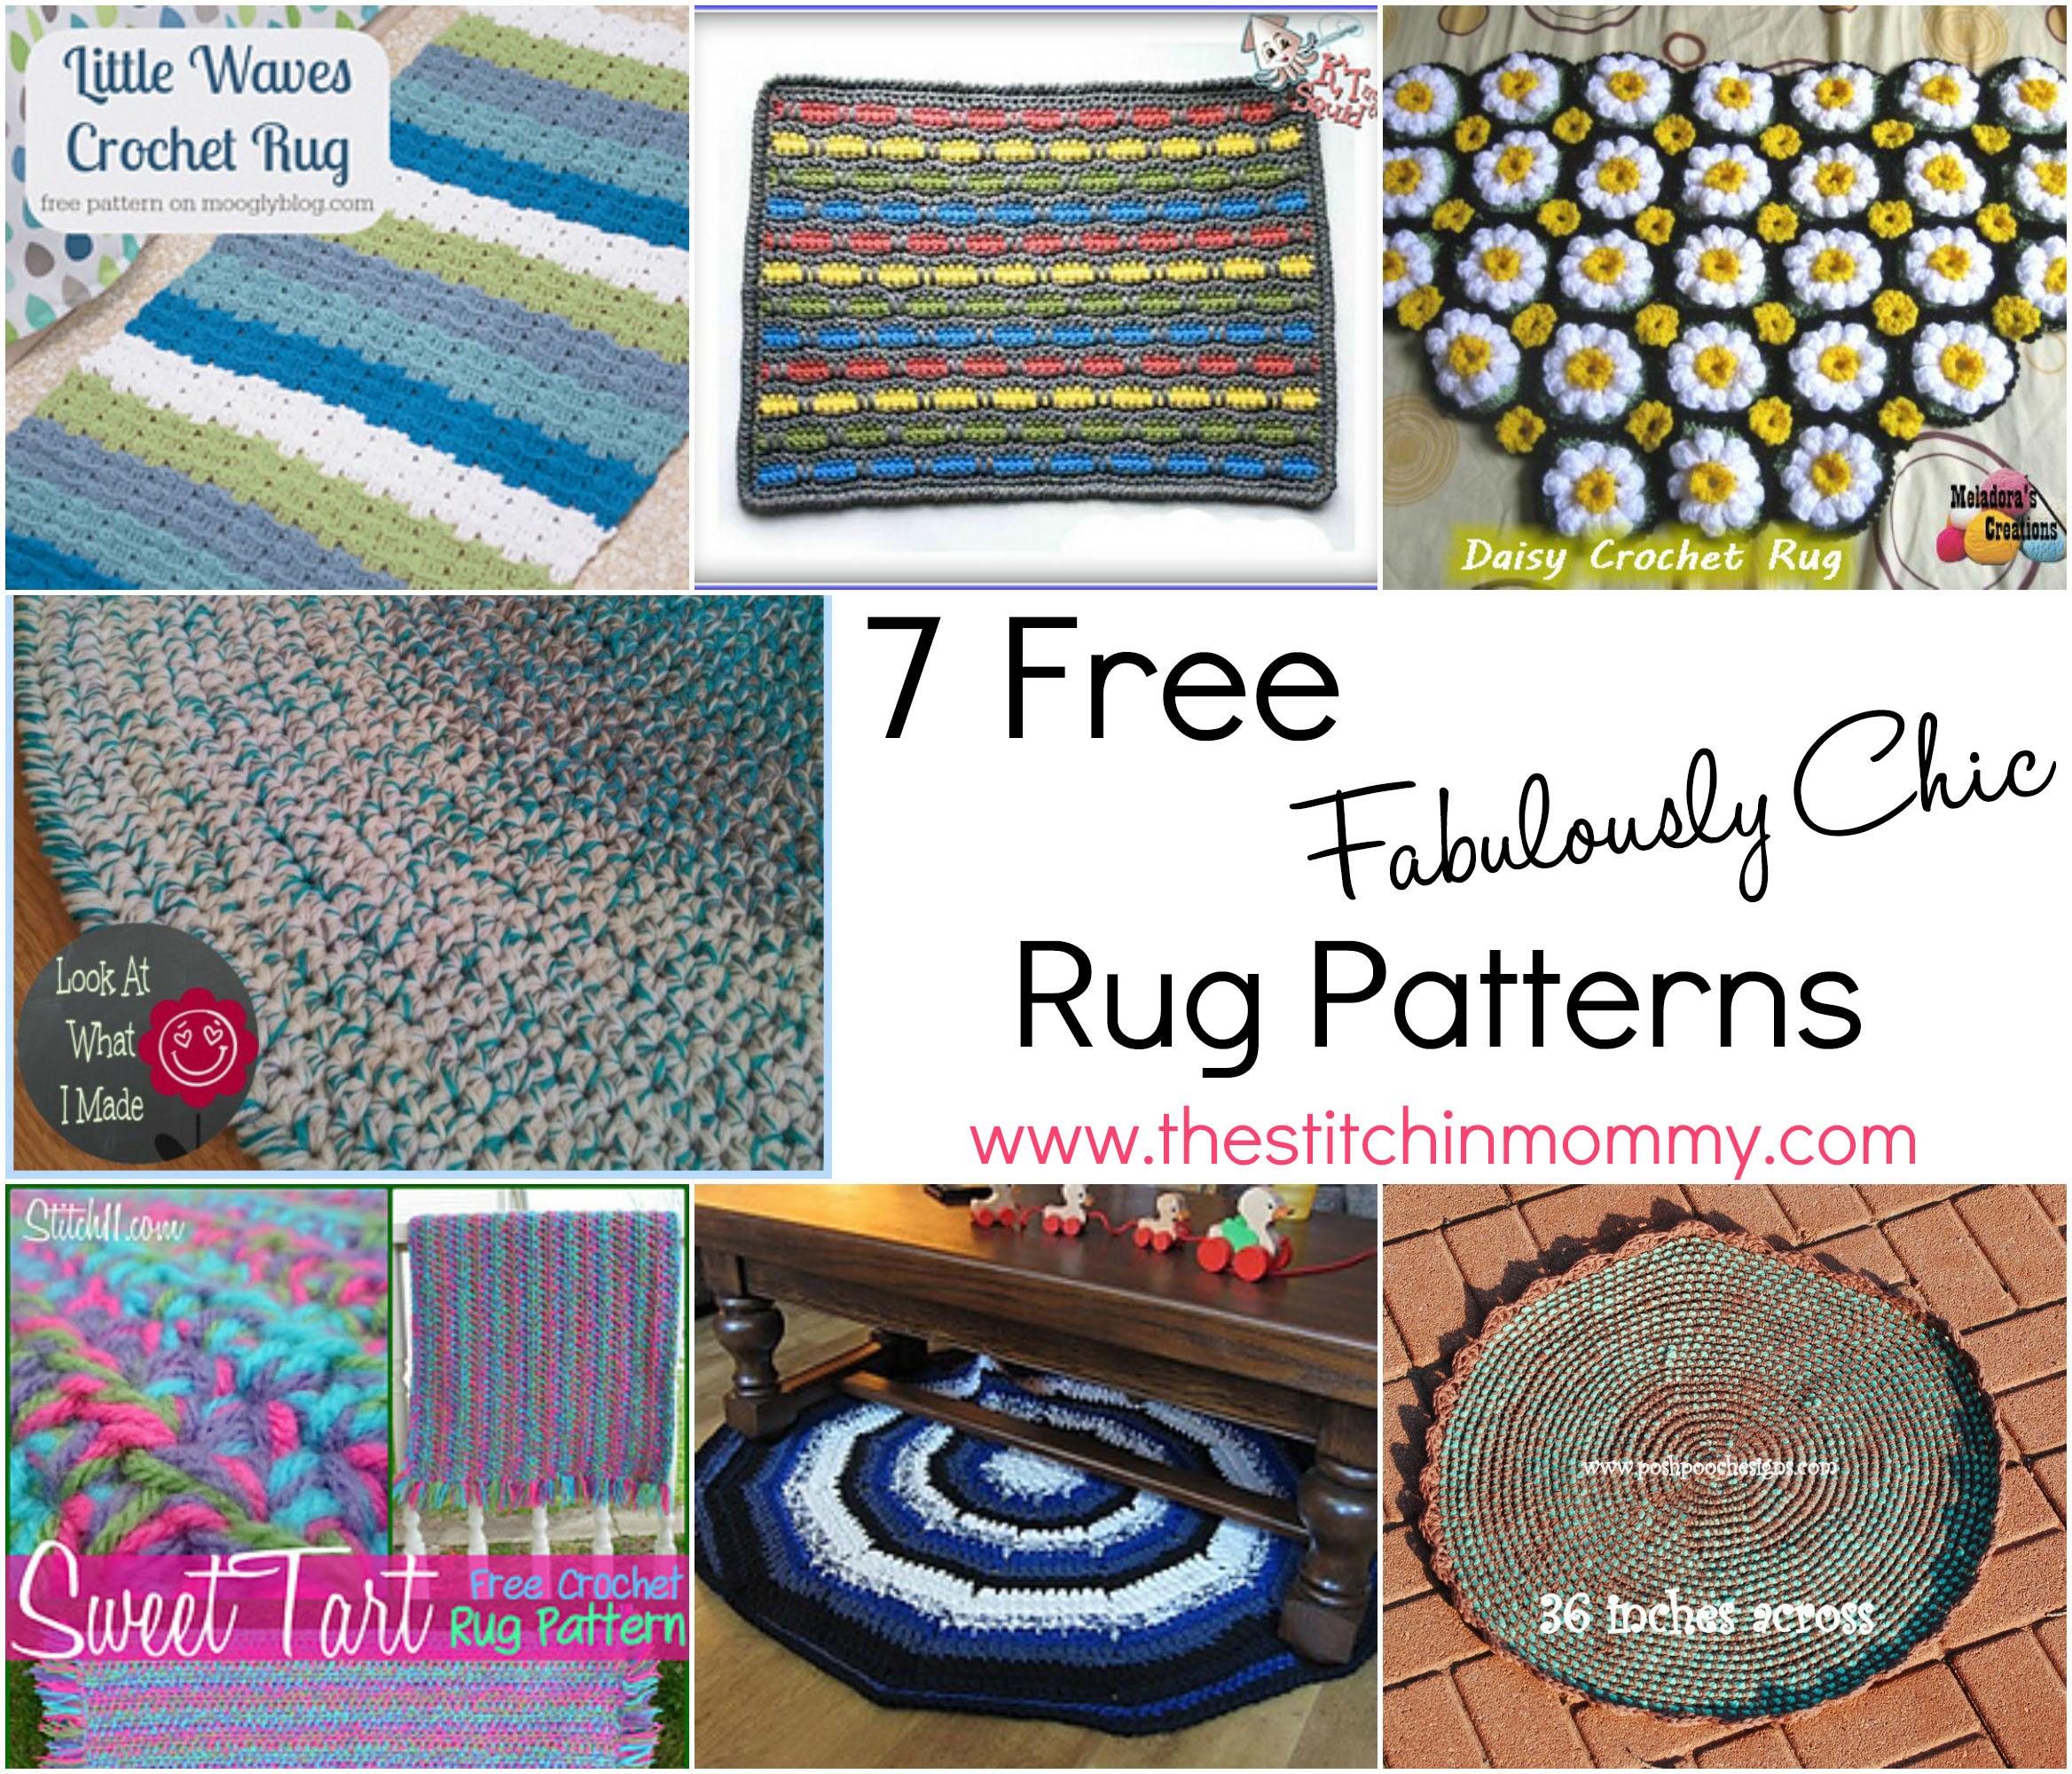 Fabulously Chic Crochet Rugs - The Stitchin Mommy